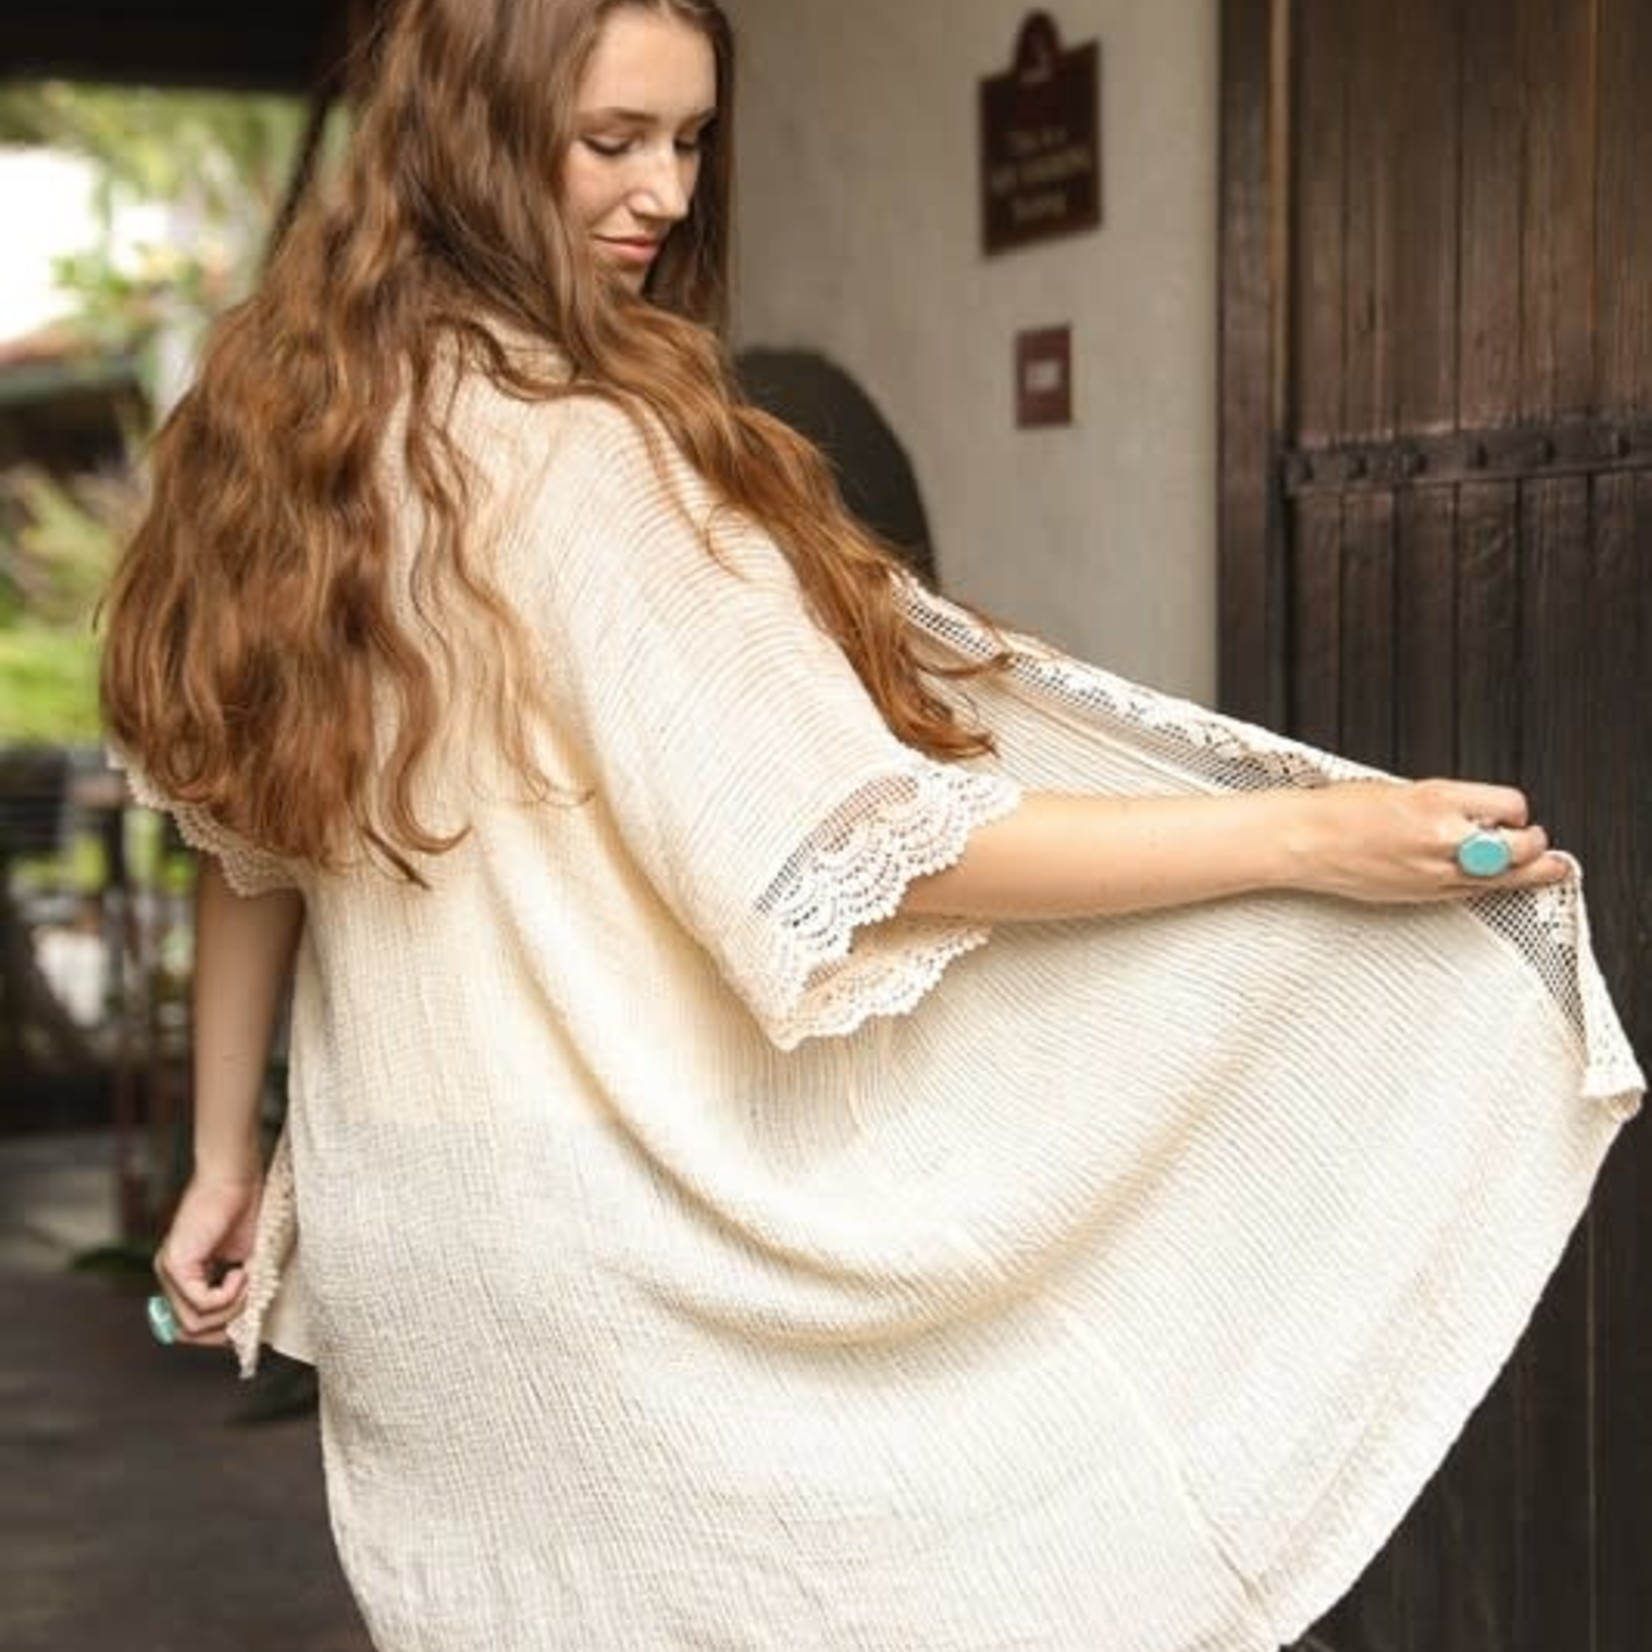 leto Scallop Lace Trim Kimono w/ Armholes